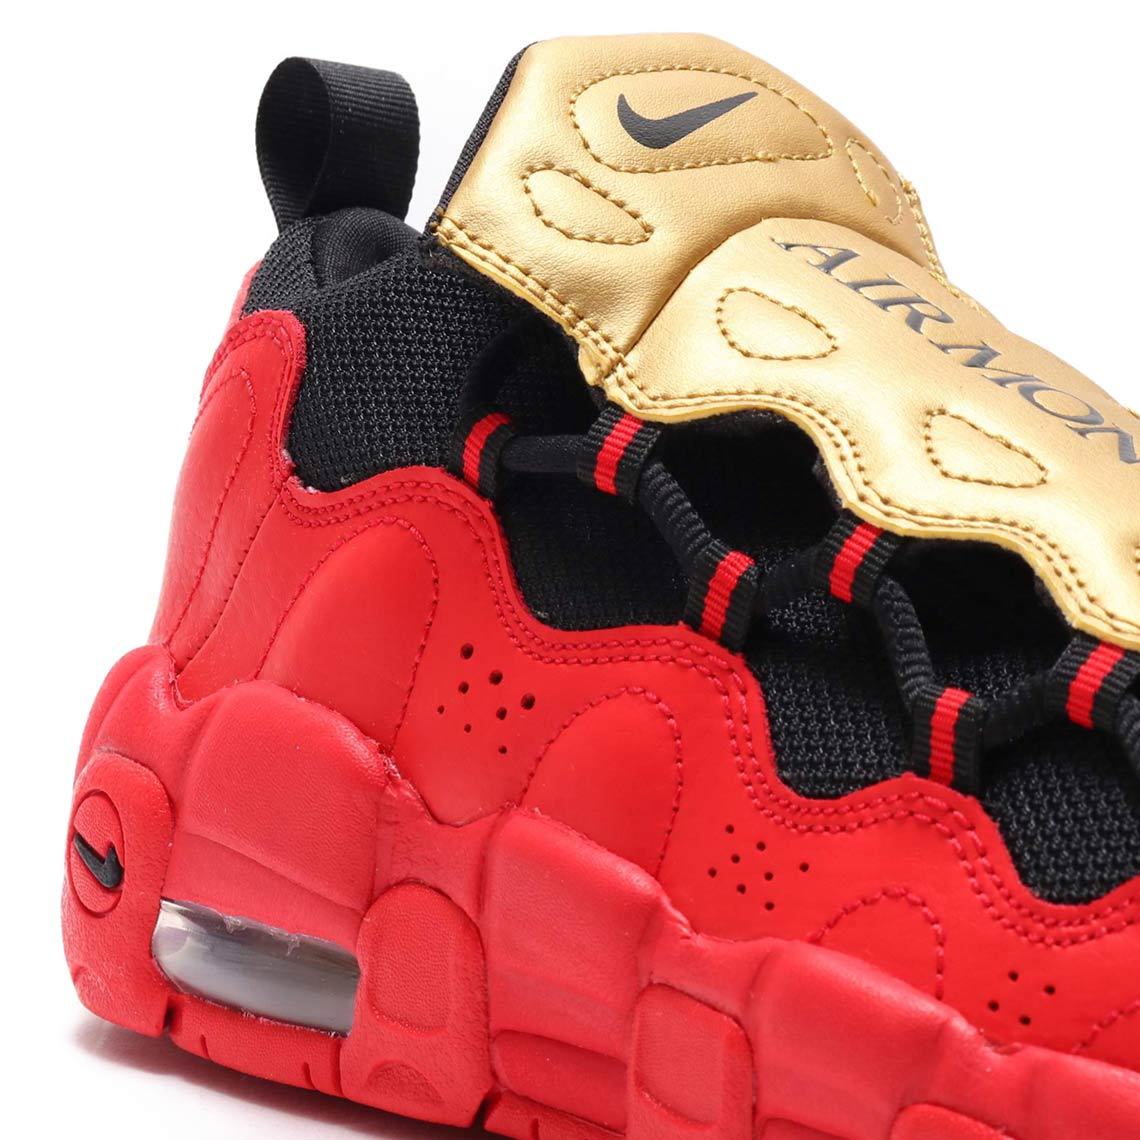 fba19cc819678 Nike Air More Money GS Gold/Red AH5215-600 | SneakerNews.com